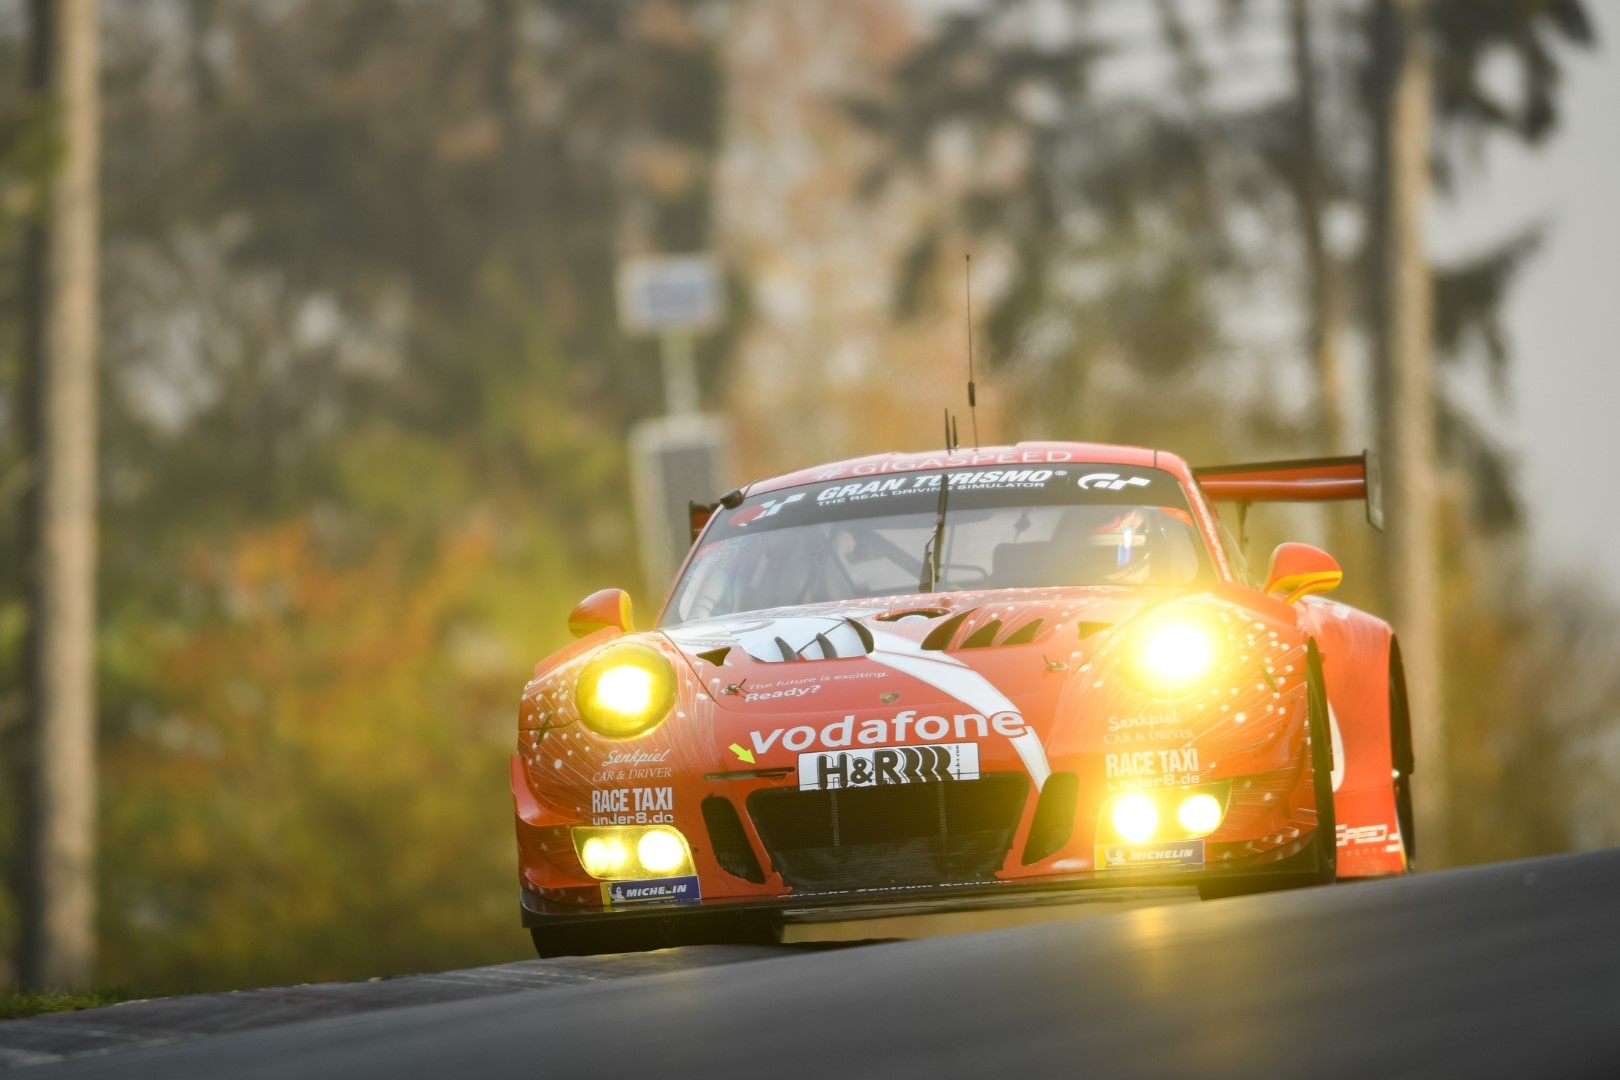 VLN 9. Lauf 2018, Nürburgring-Nordschleife - Foto: Gruppe C Photography; #002 Porsche 911 GT3 R, Team GetSpeed Performance: Steve Jans, Marek Böckmann, Adam Osieka